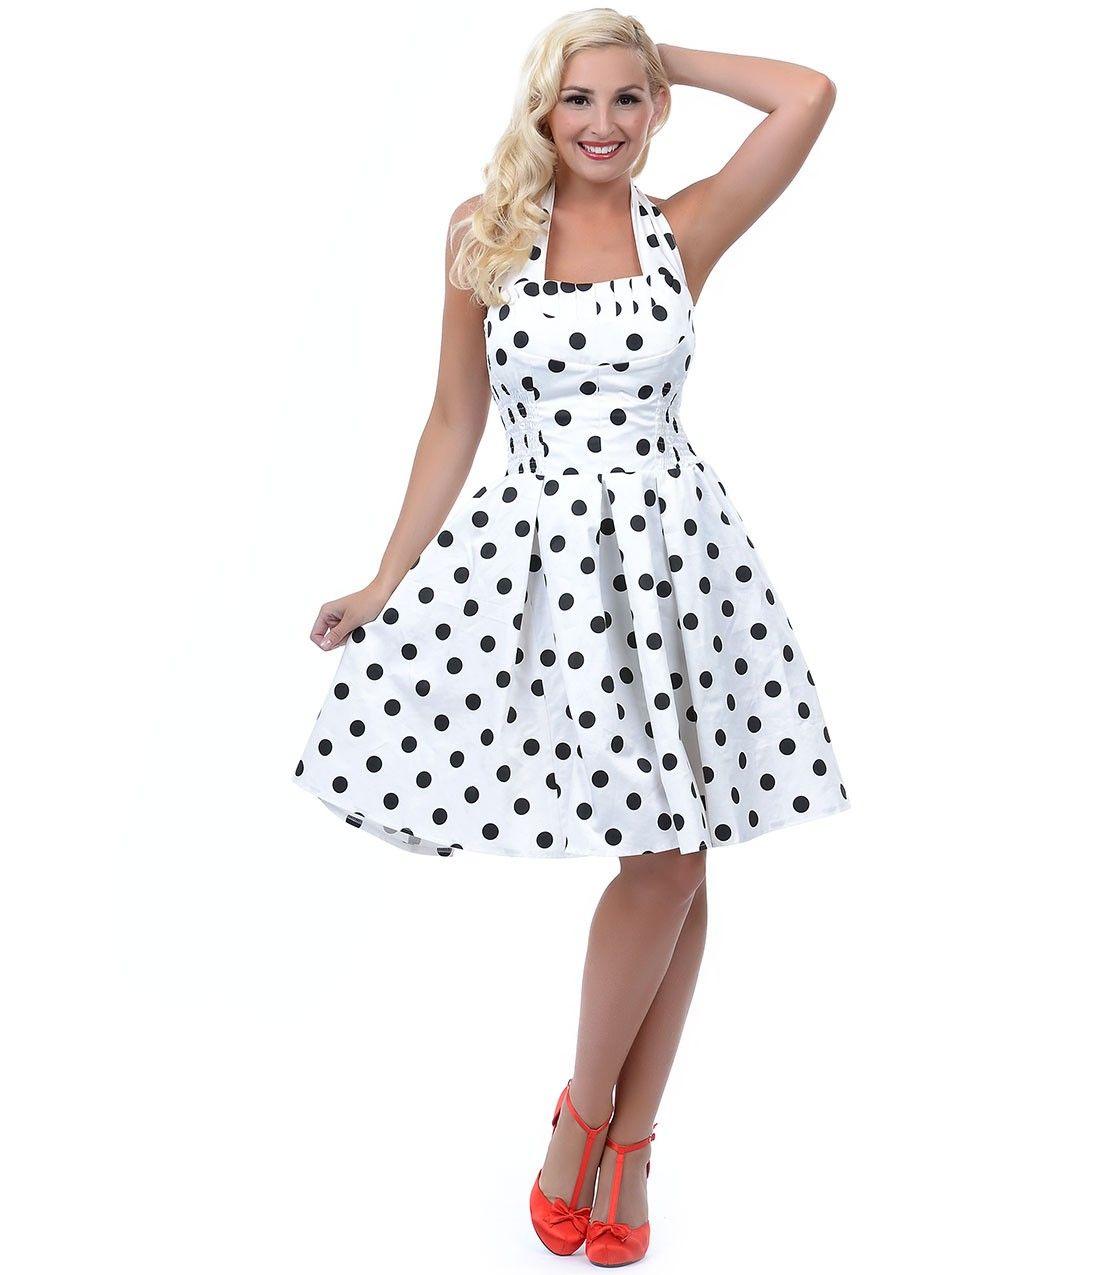 Black dress with big white polka dots